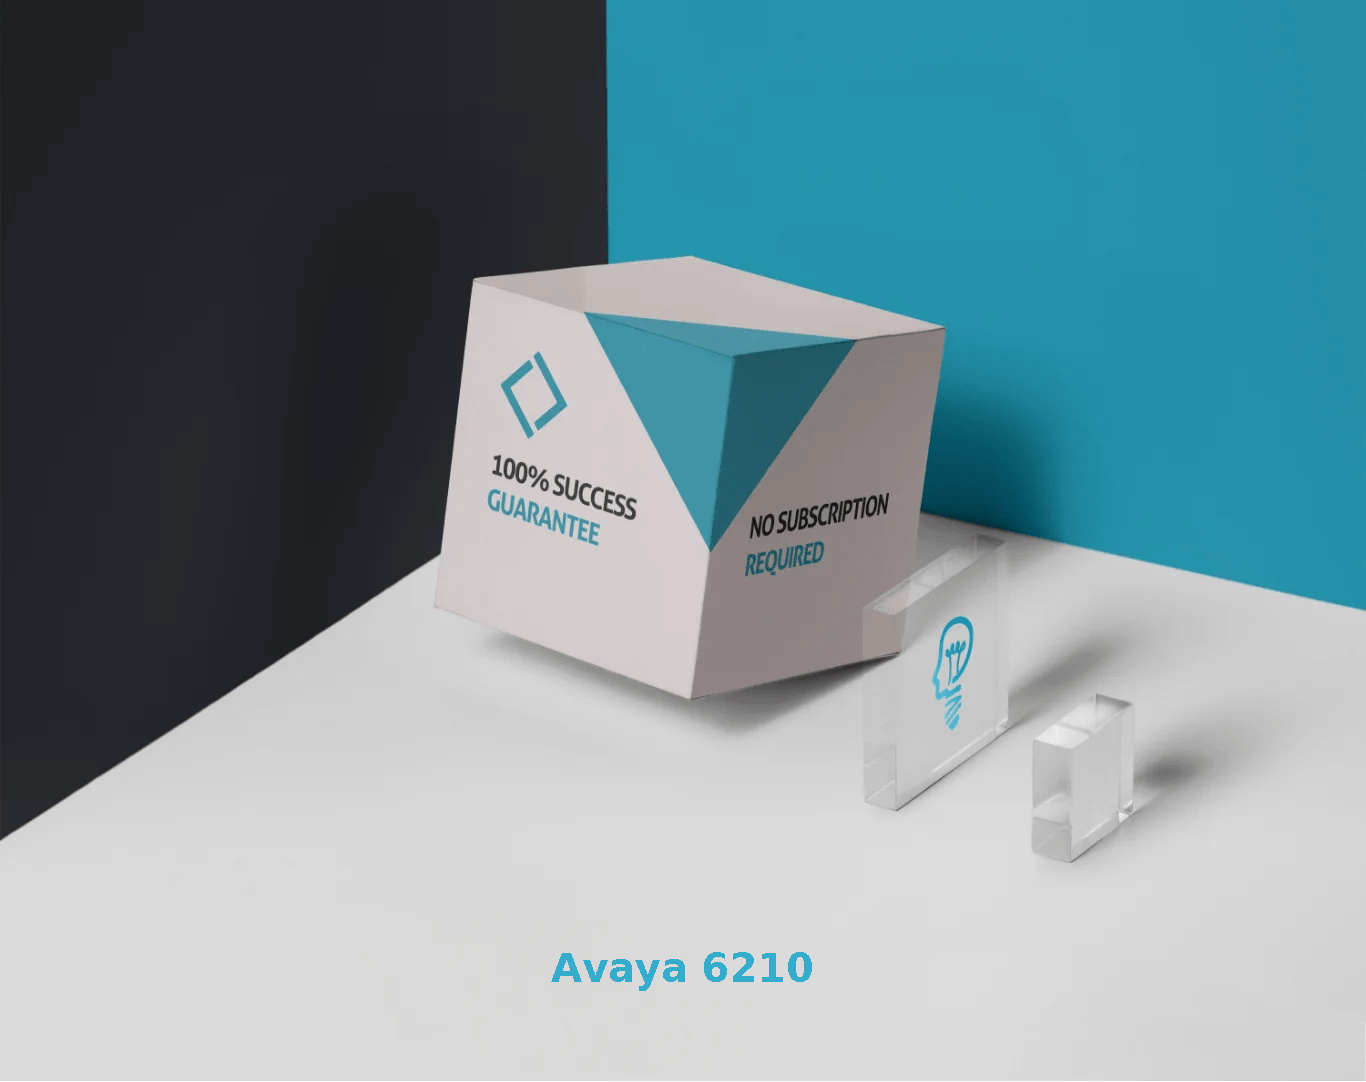 Avaya 6210 Exams